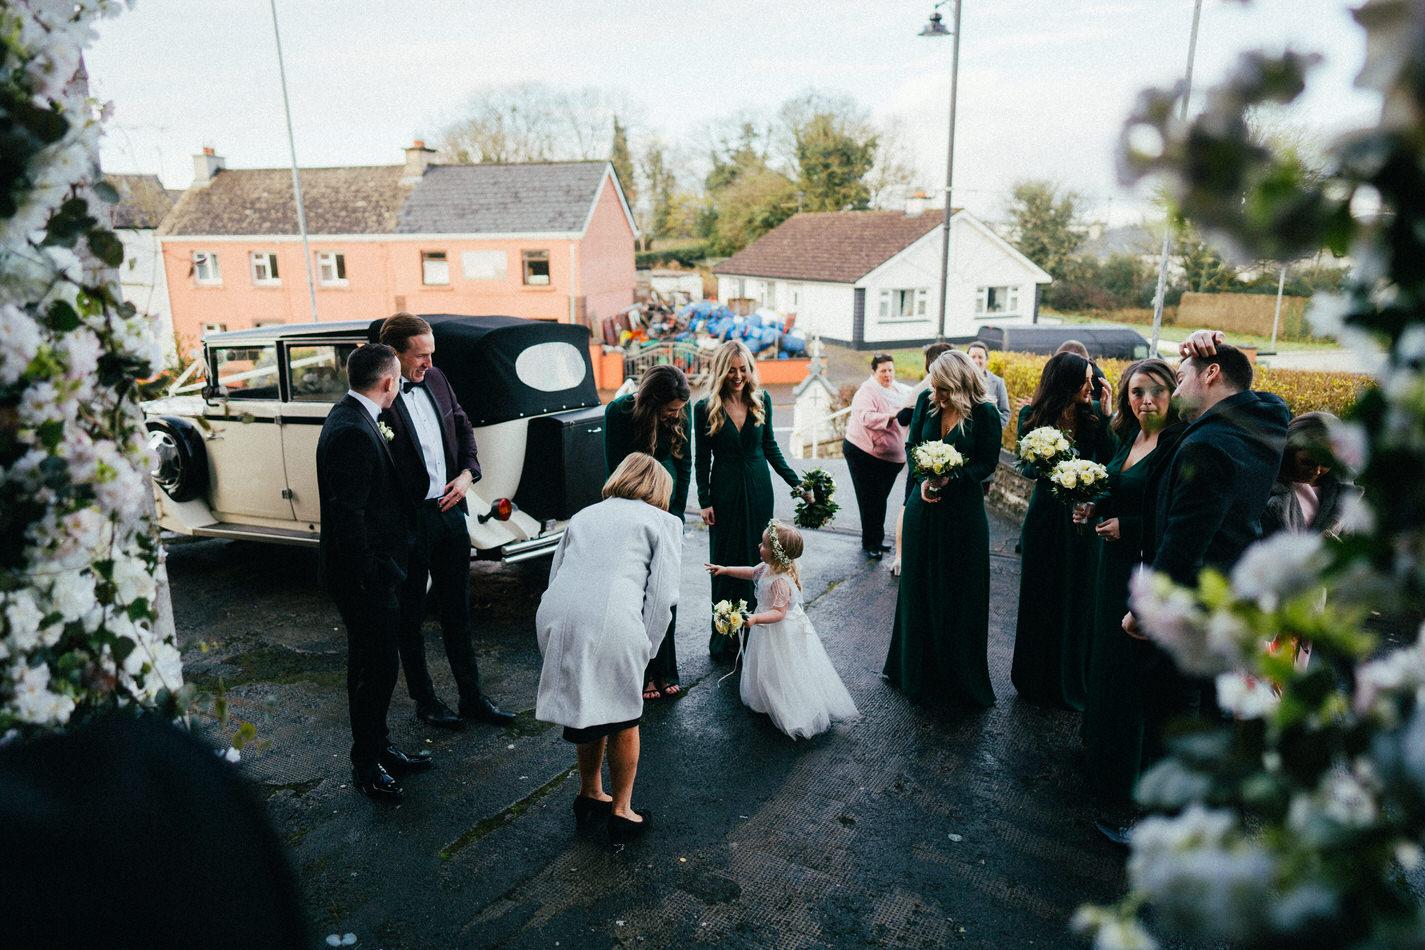 Castle-wedding-ireland-photos- 0160 112